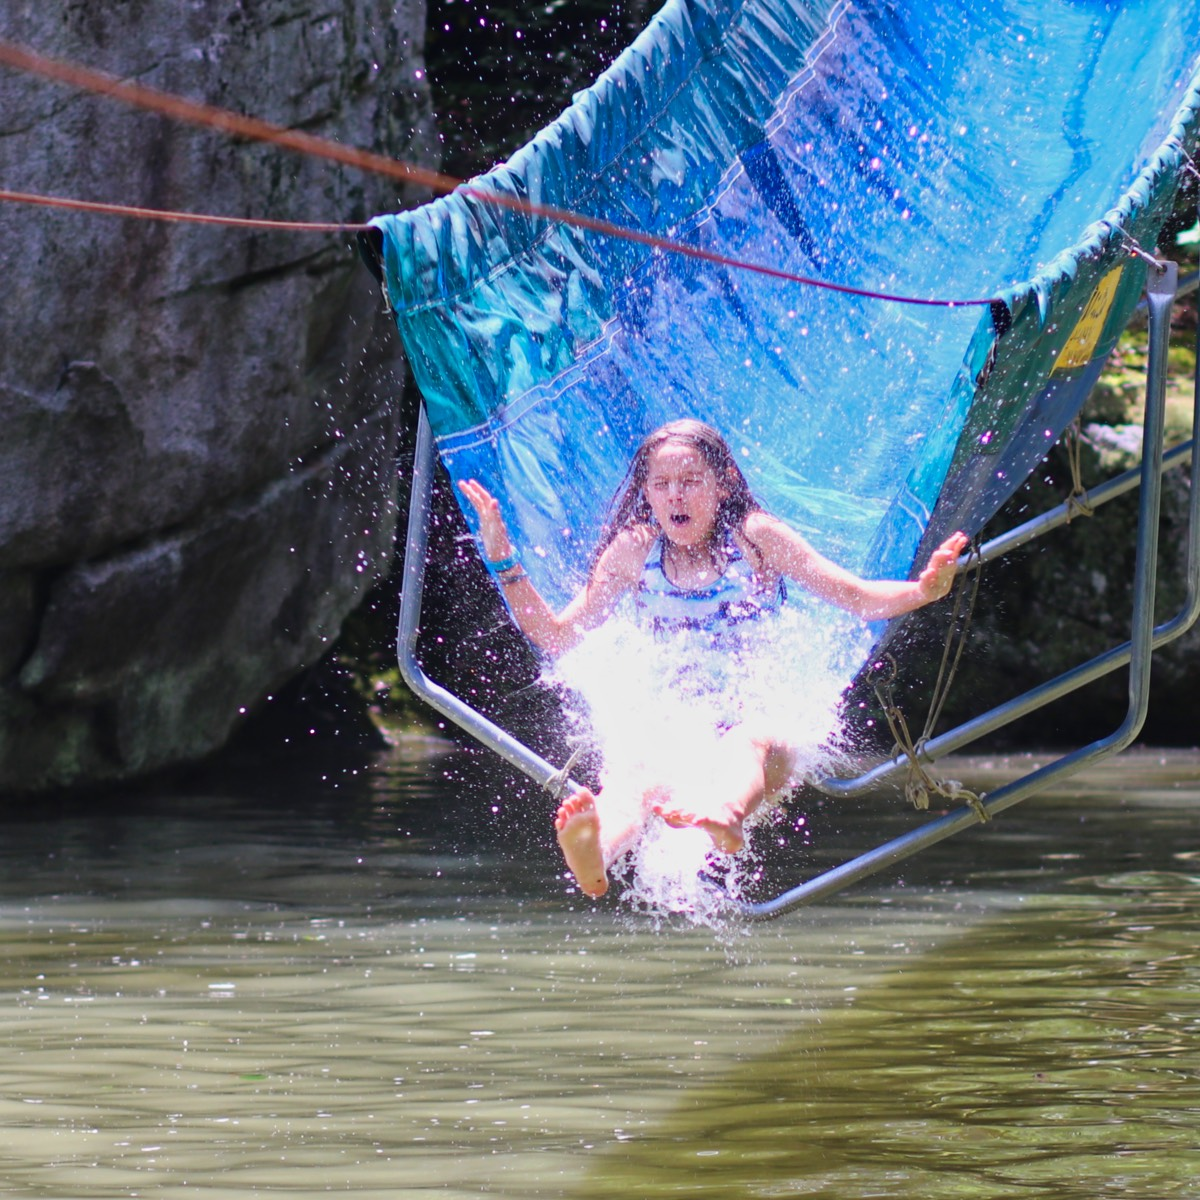 water slide plunge